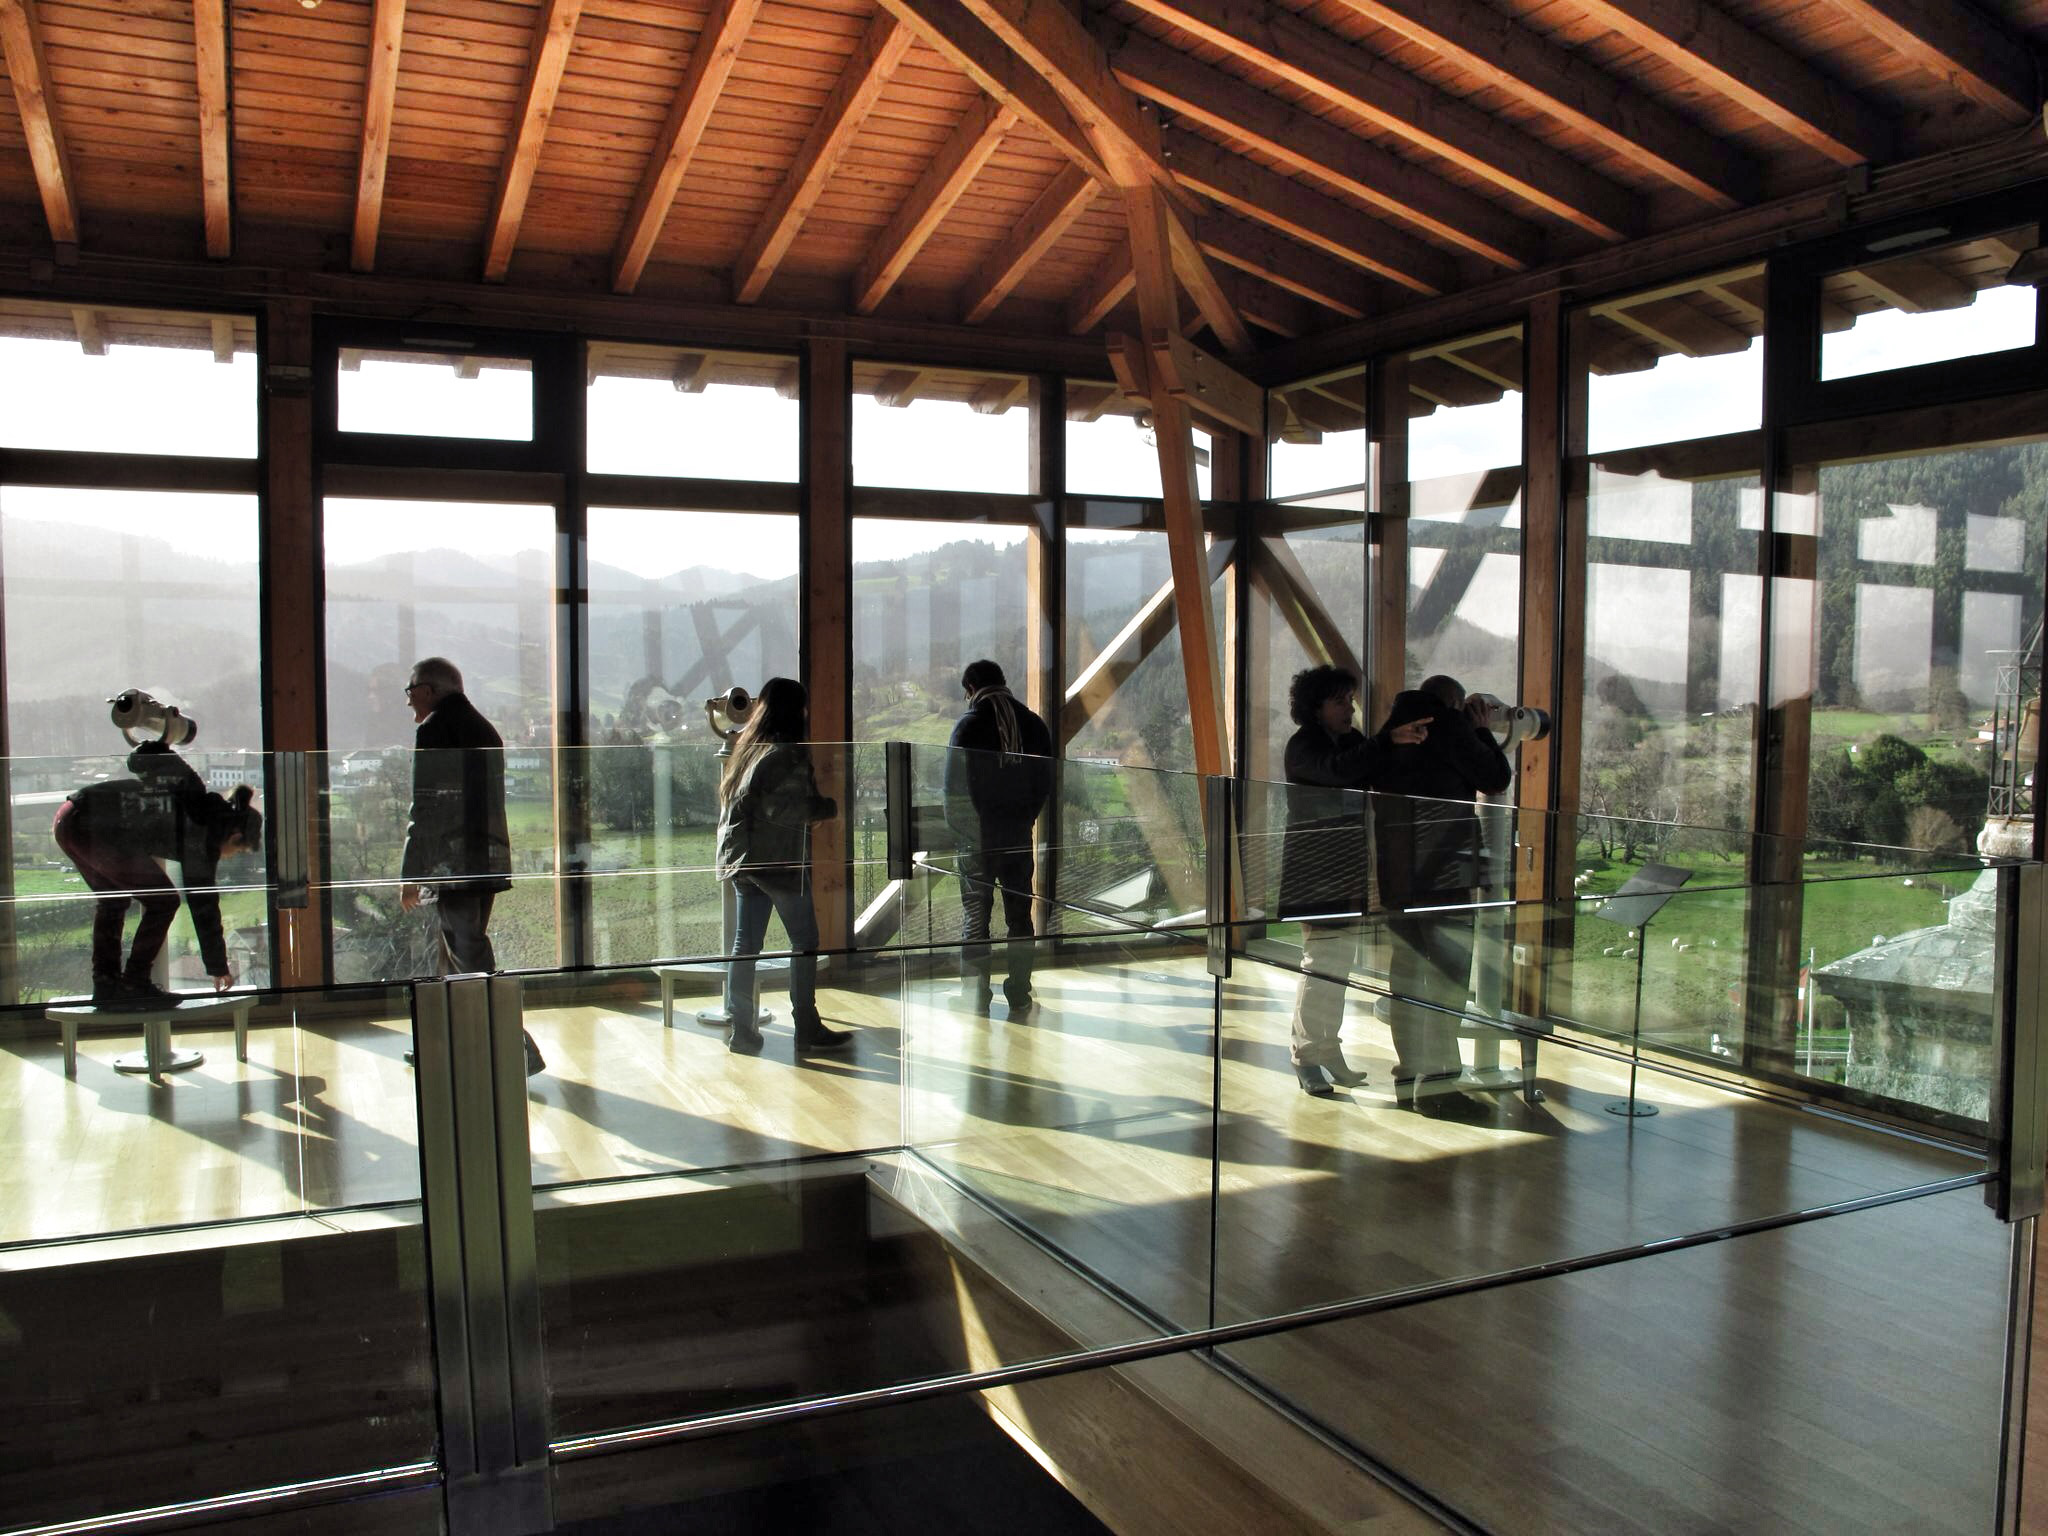 torre madariaga_centro biodiversidad euskadi_patrimonio_rehabilitación_vistas